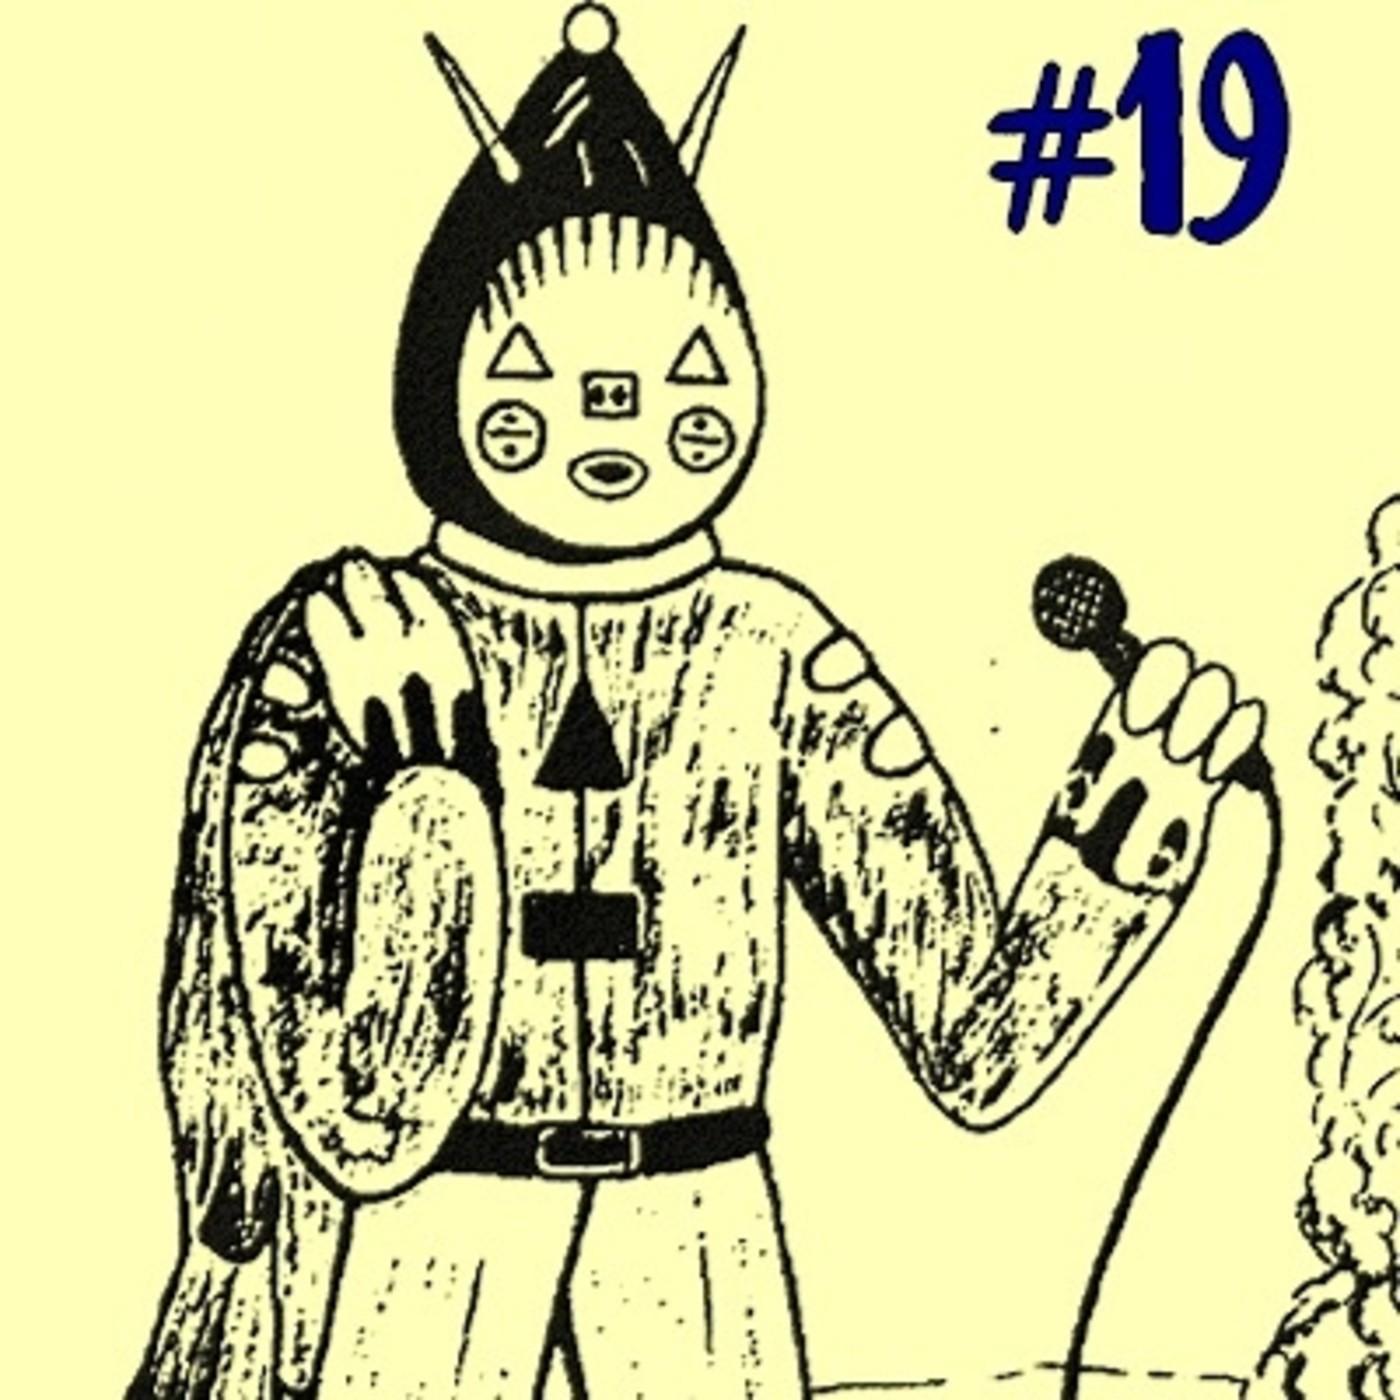 19- O Misterioso SAM. Fantasma ou Alien?